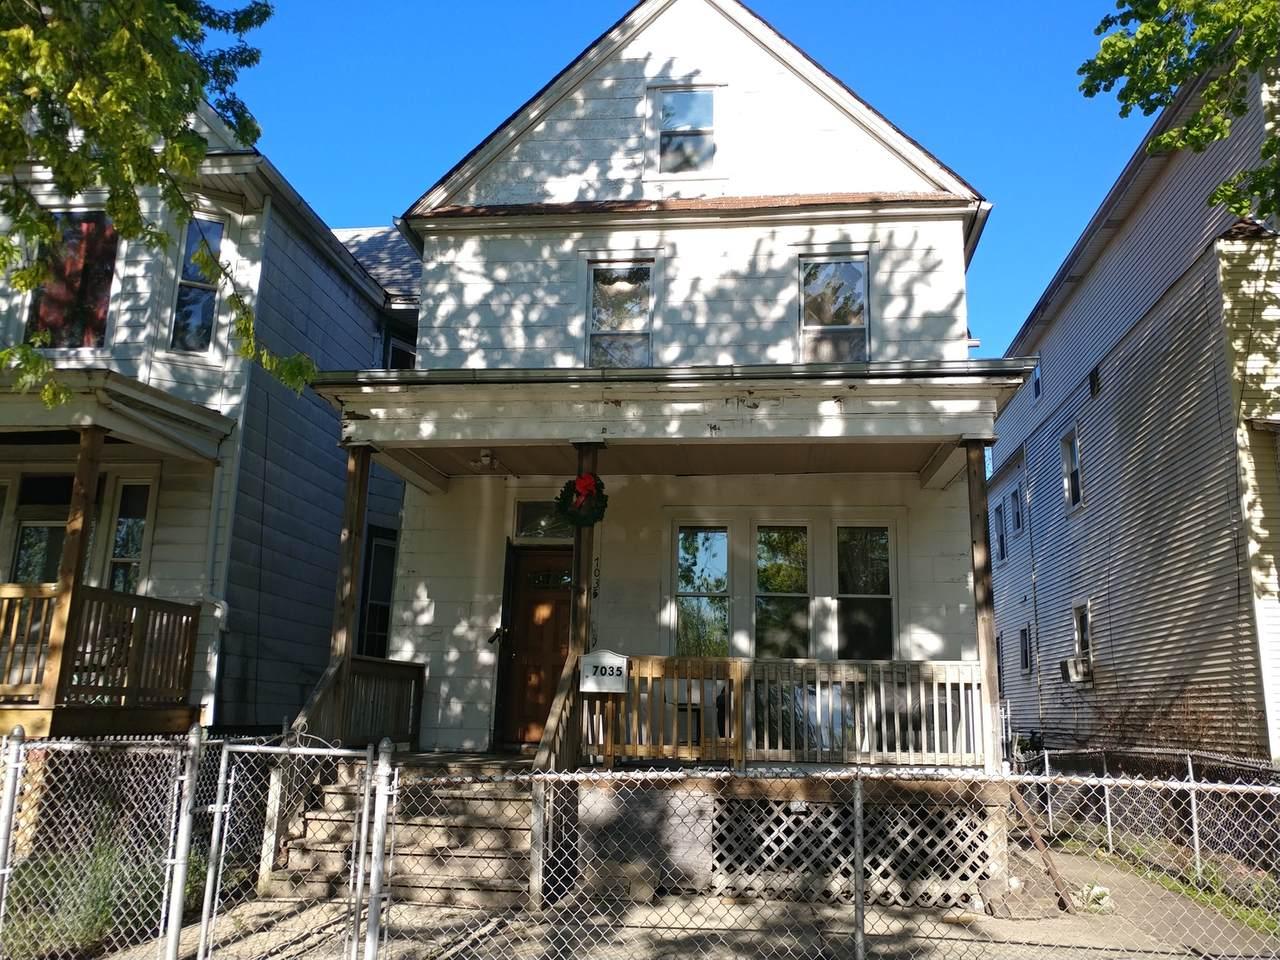 7035 Parnell Avenue - Photo 1